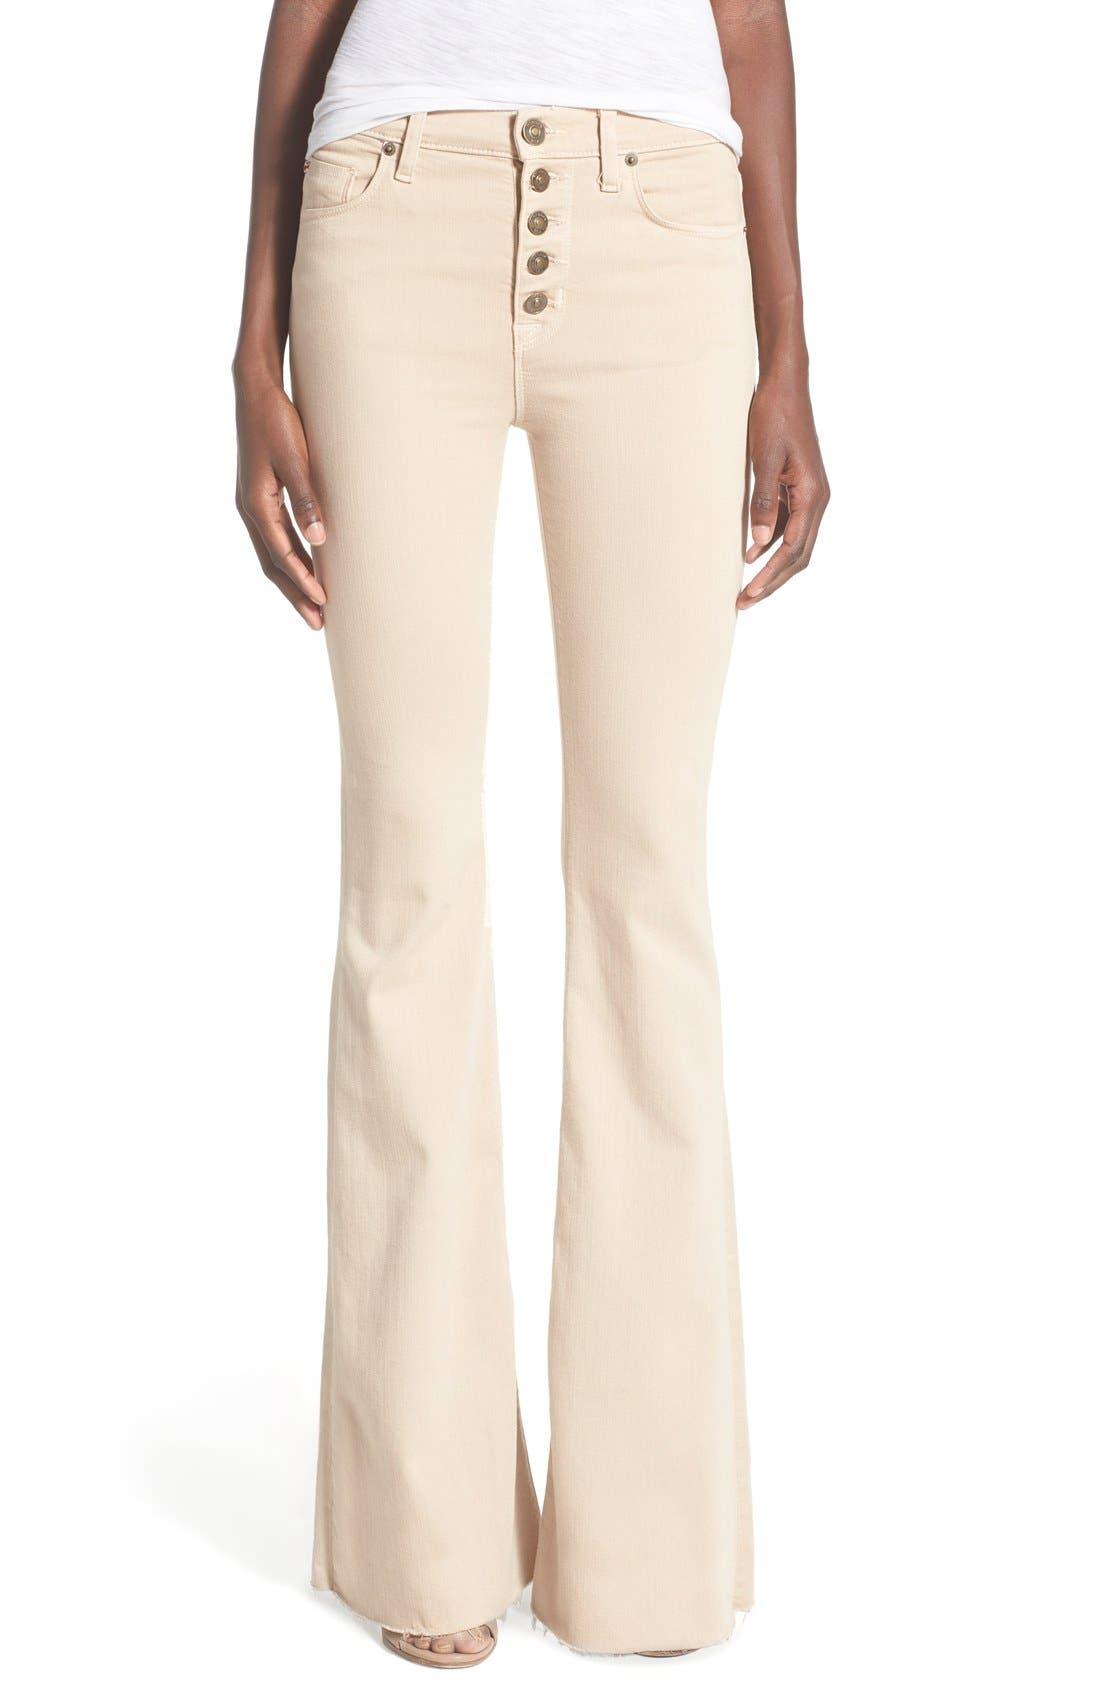 Main Image - Hudson Jeans 'Jodi' Flare Jeans (Parachute Khaki)